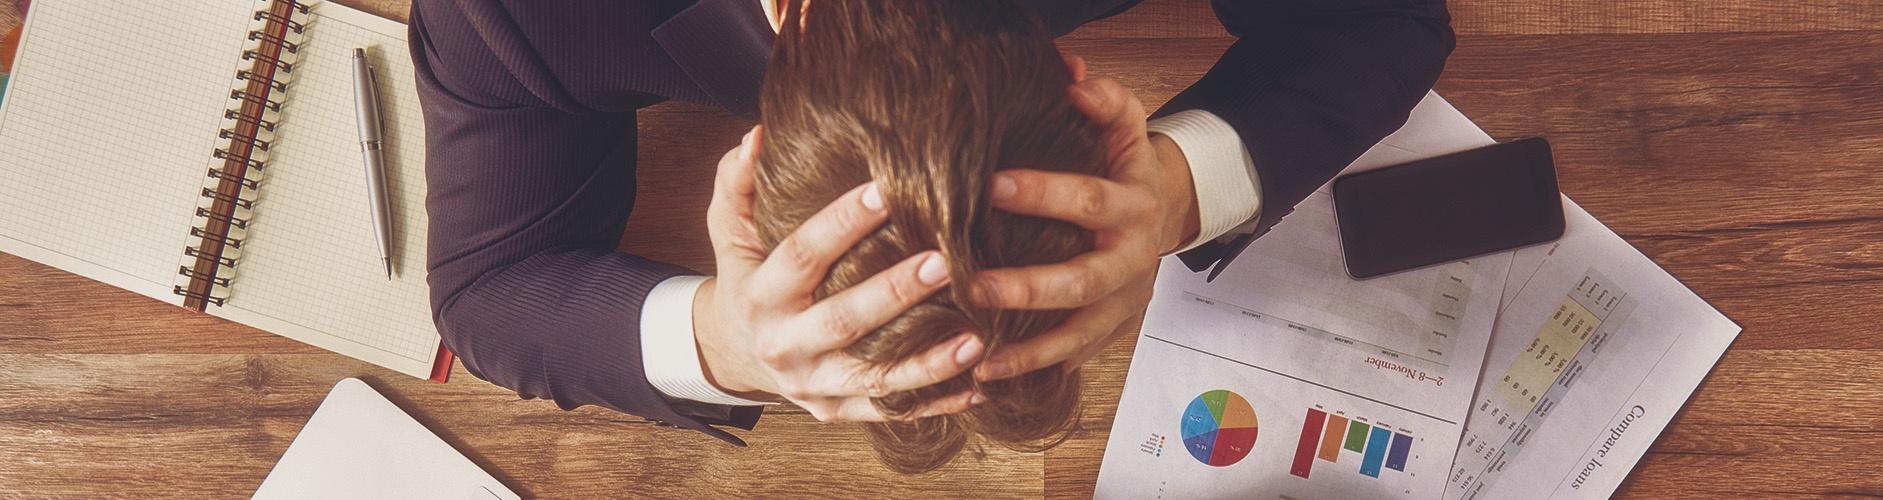 3 ways to address stress in the workplace